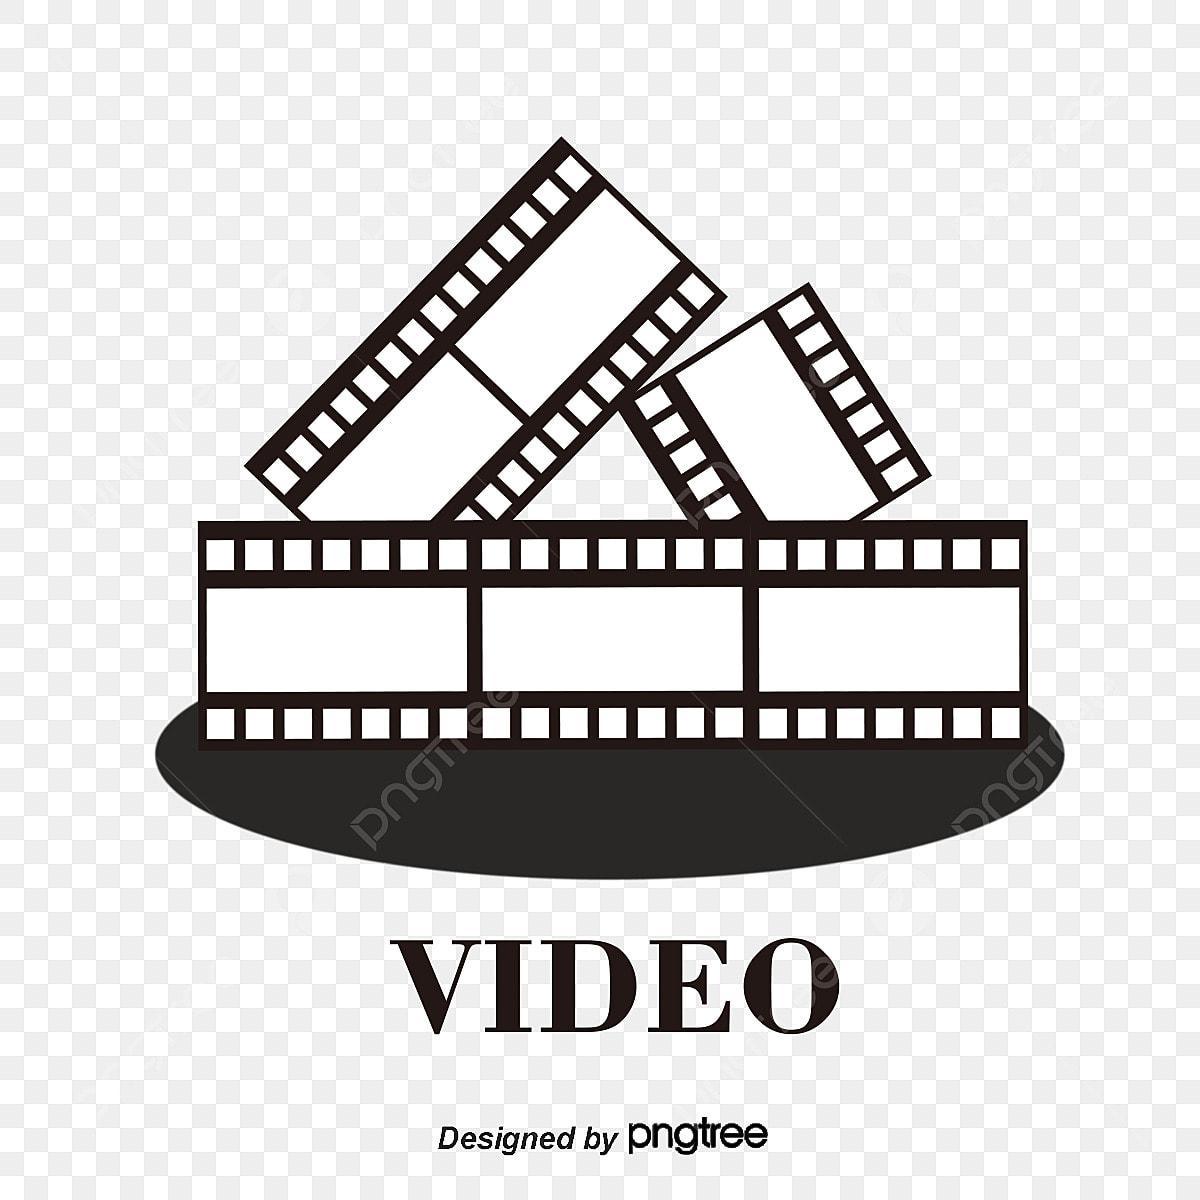 Pelicula Gratis Logo Vector Image Video Cine Gratis Elemento